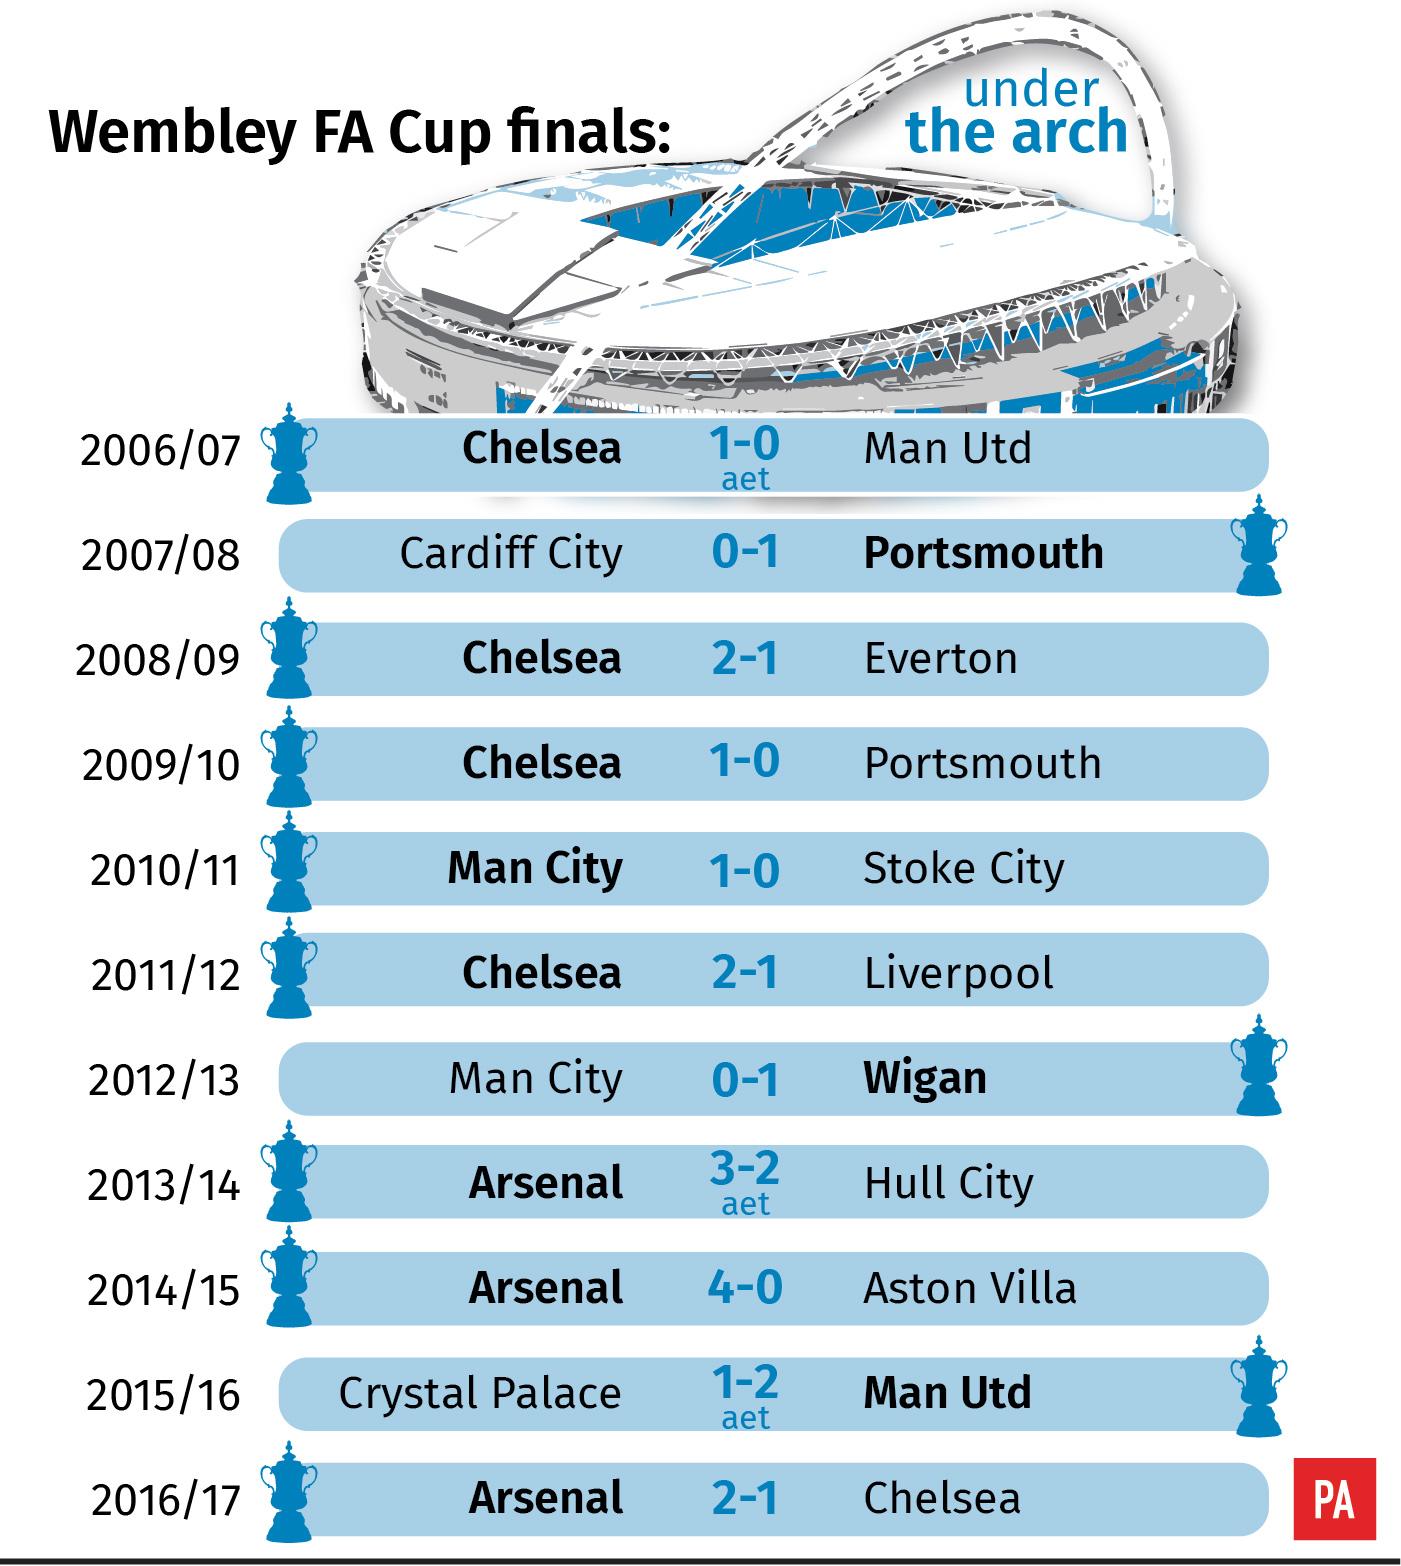 History of FA Cup finals at the new Wembley